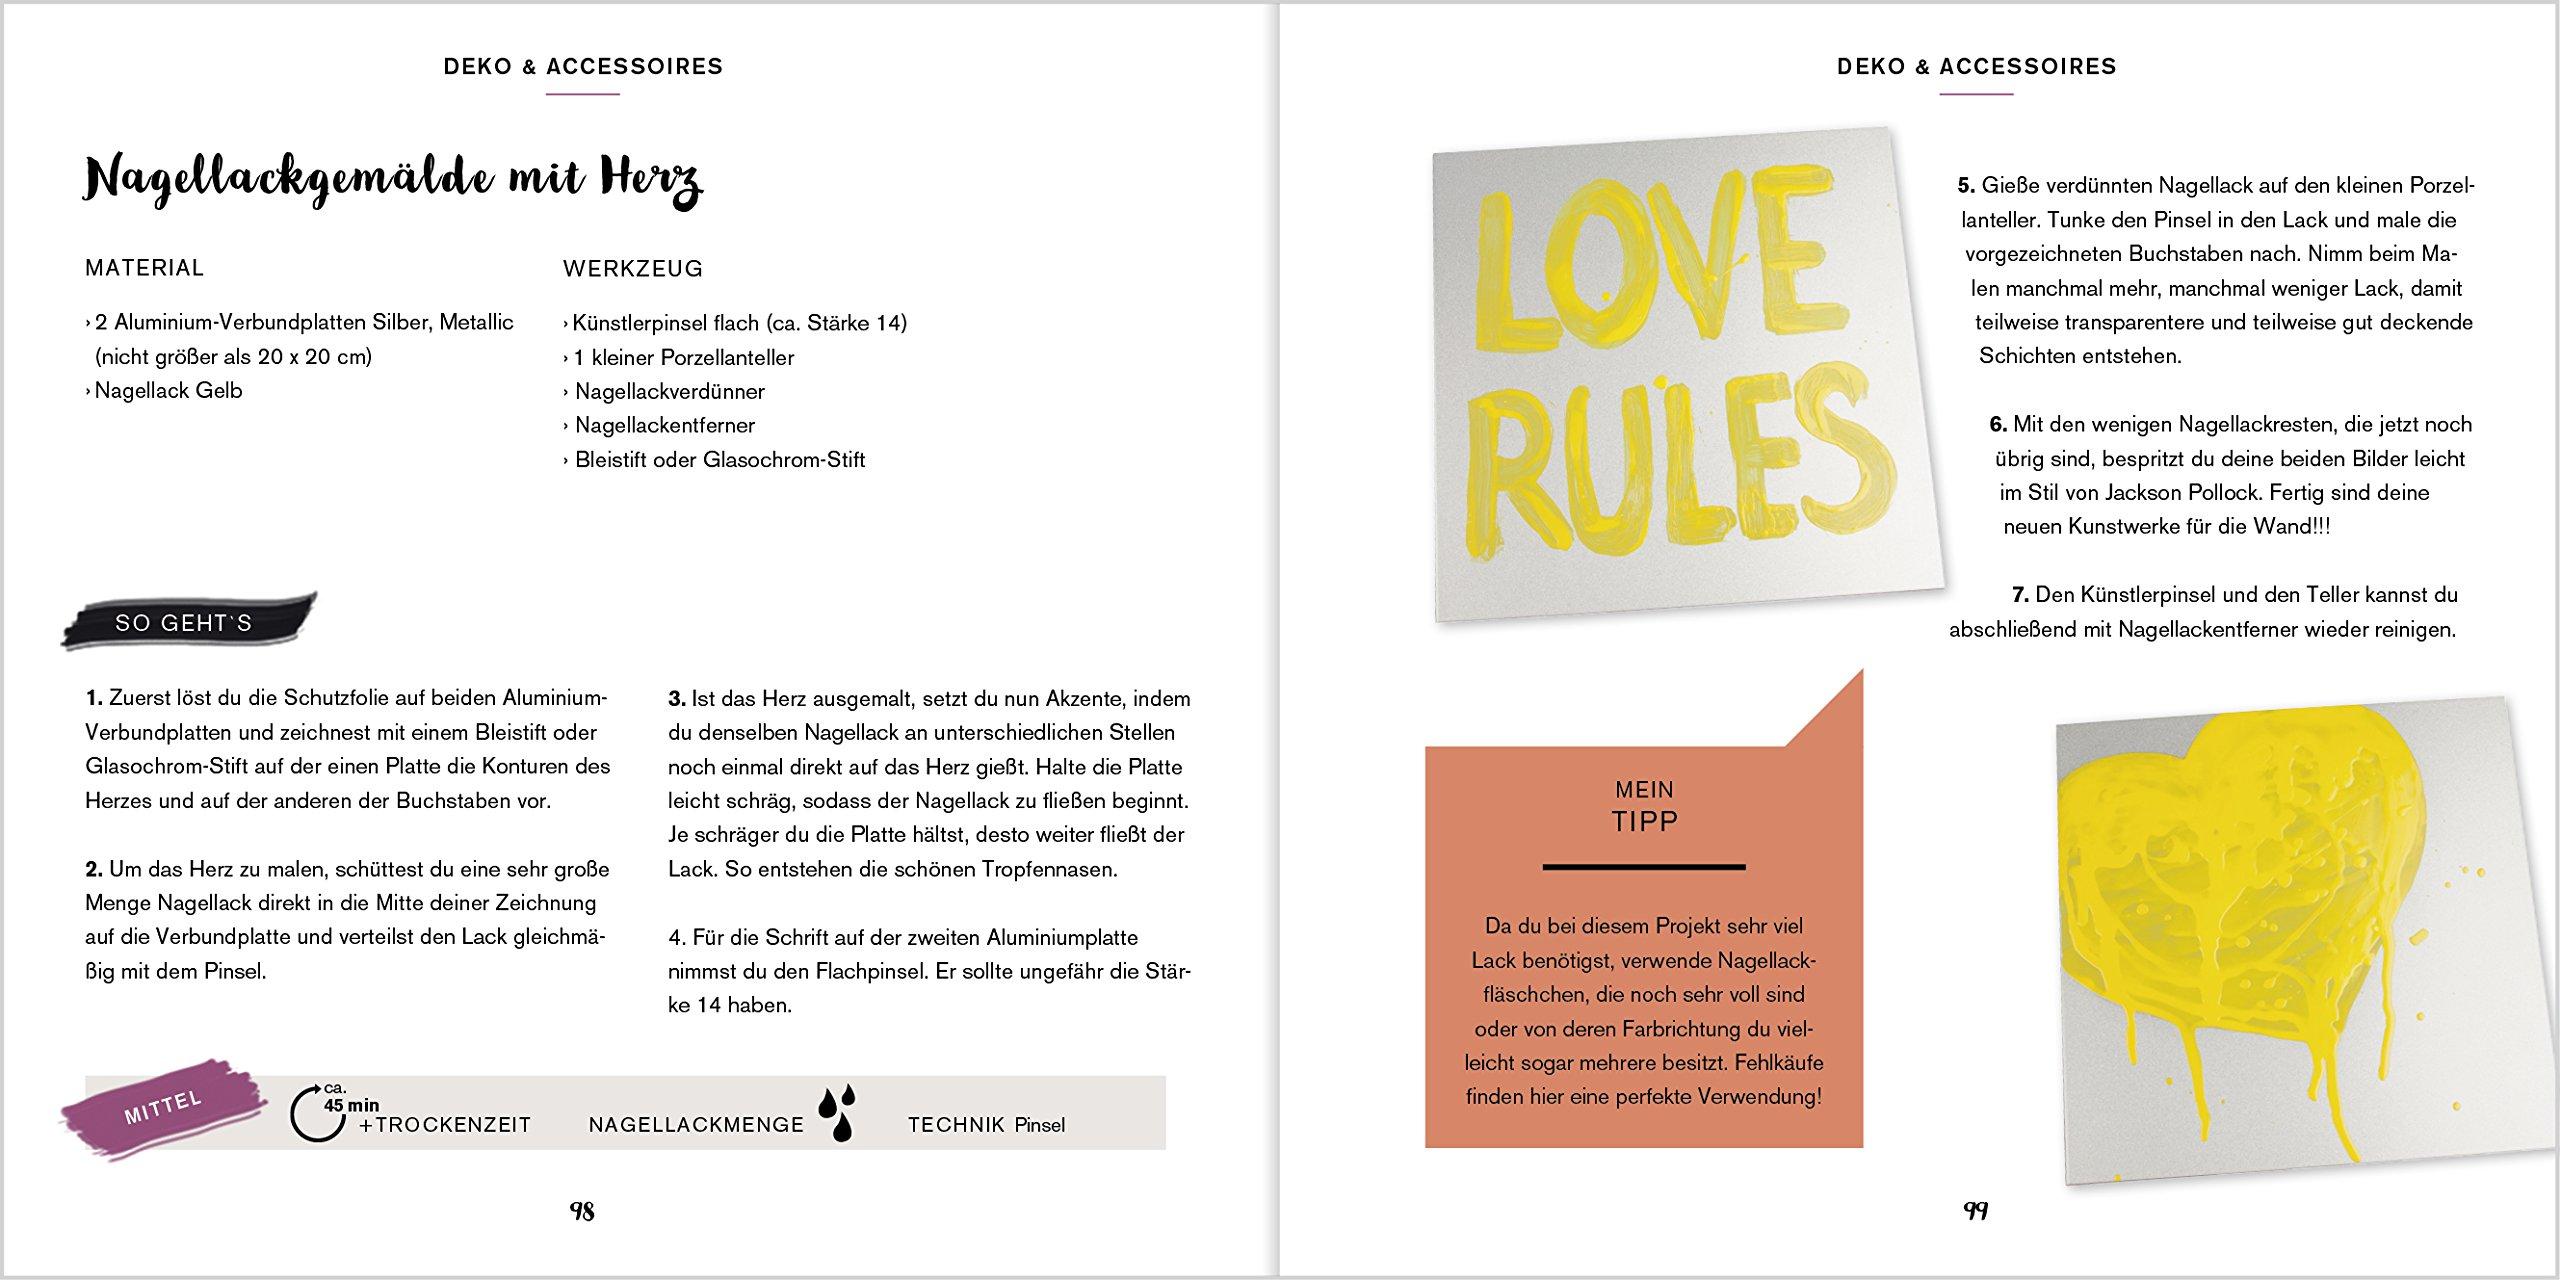 Kreativ mit Nagellack: 40 coole DIY-Ideen mit Nagellack.: Amazon.de ...